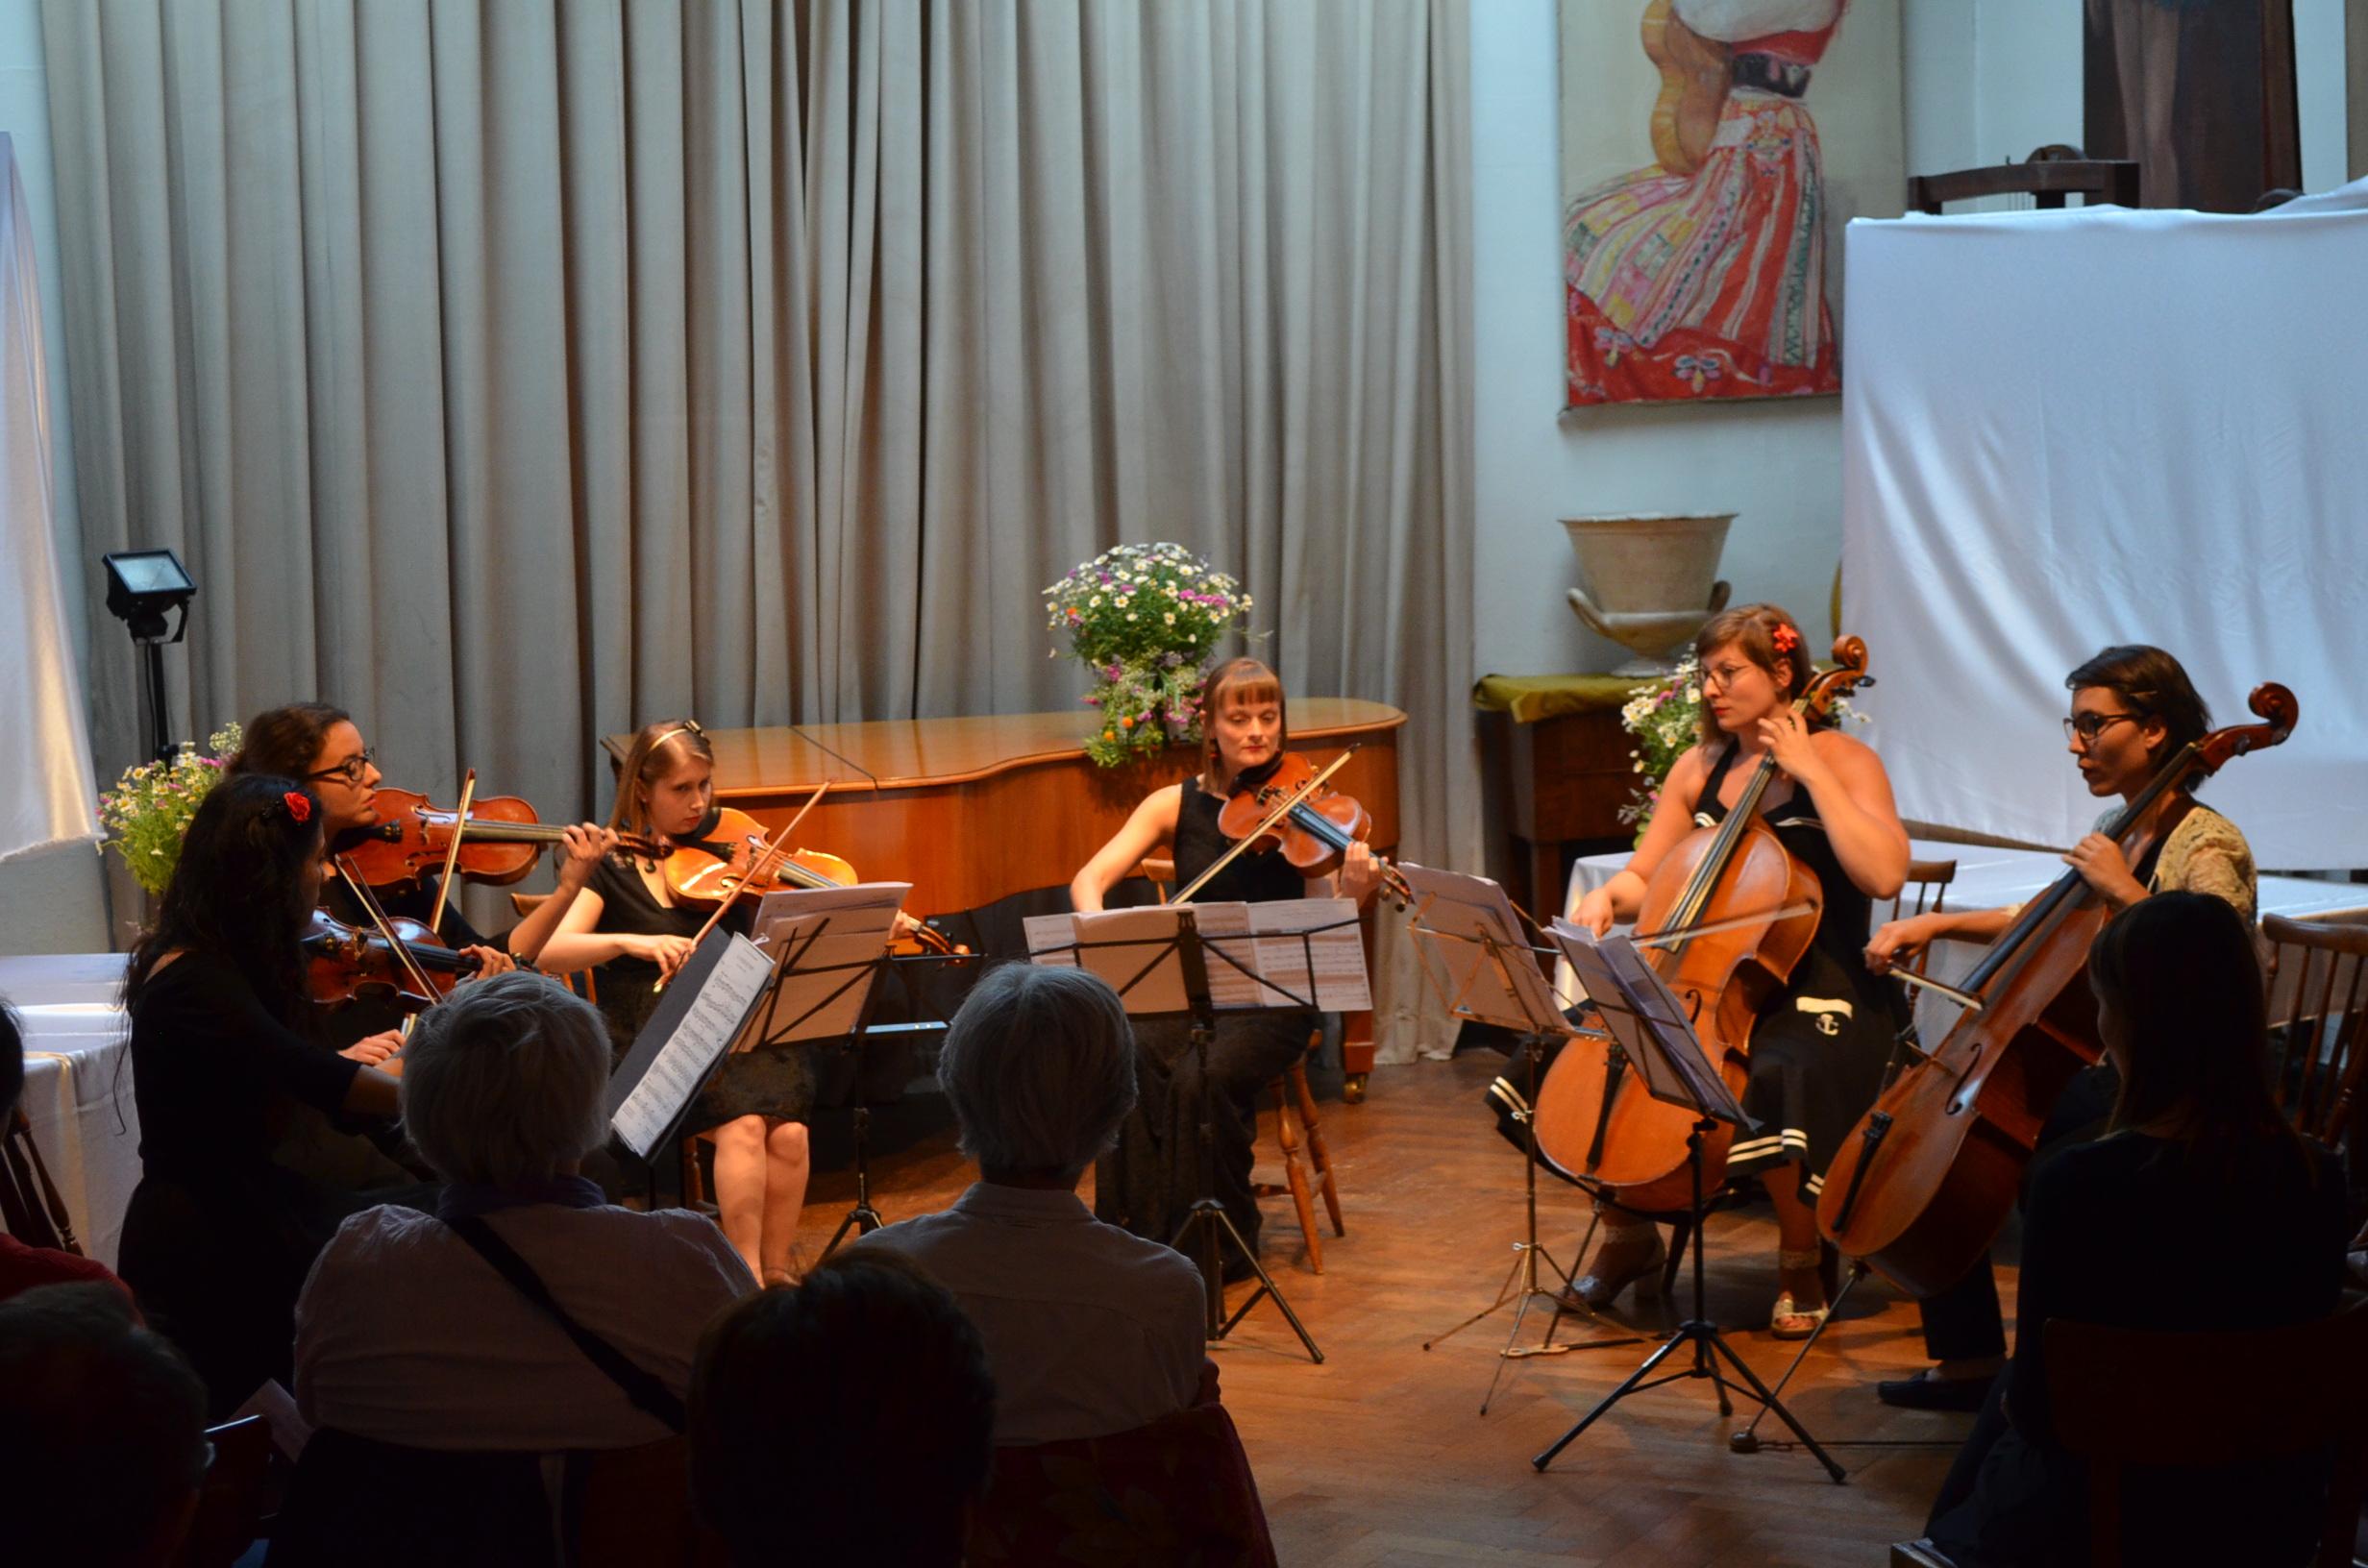 chamber music concert